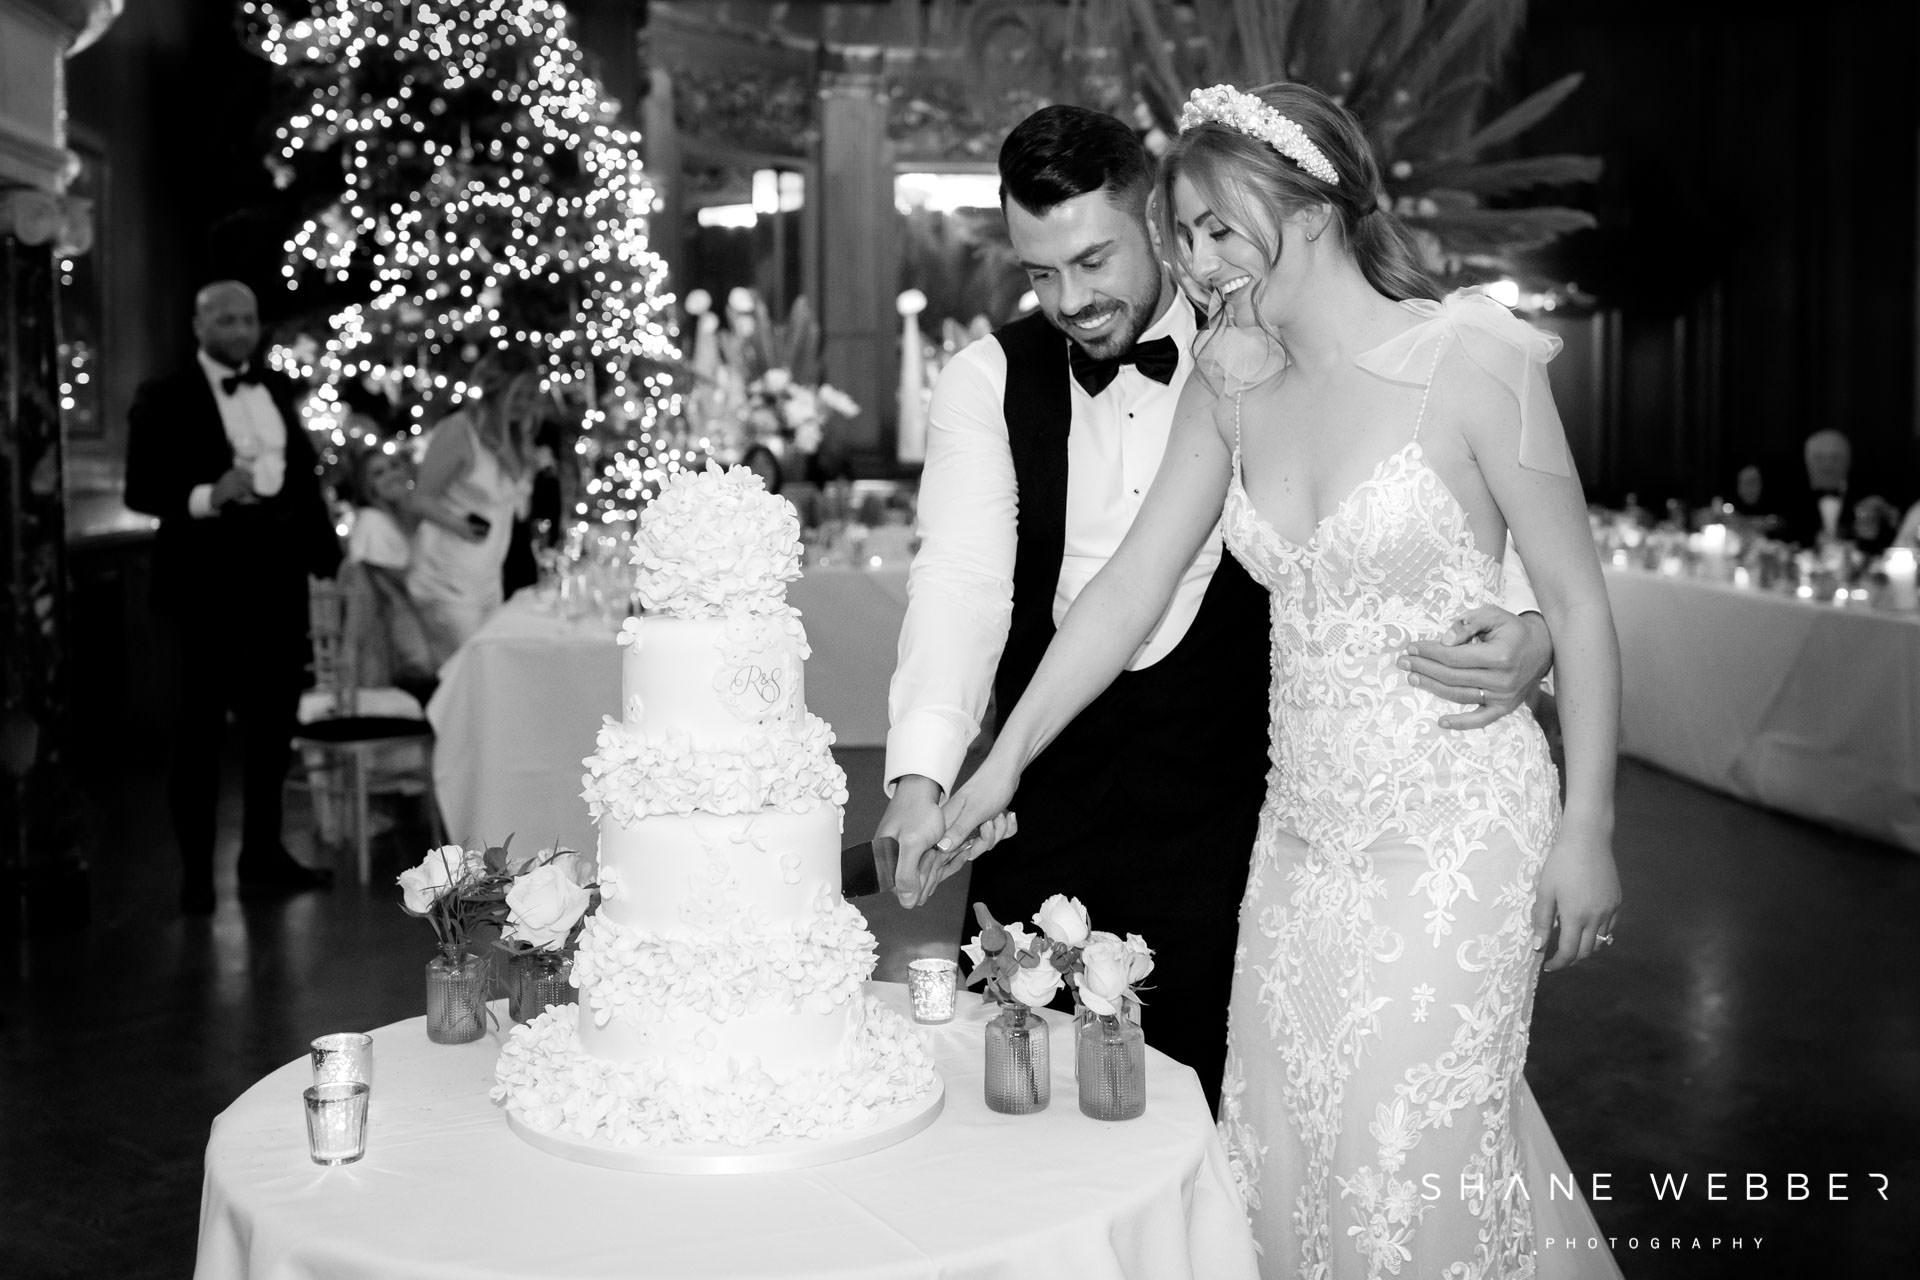 Bride and groom cutting luxury wedding cake